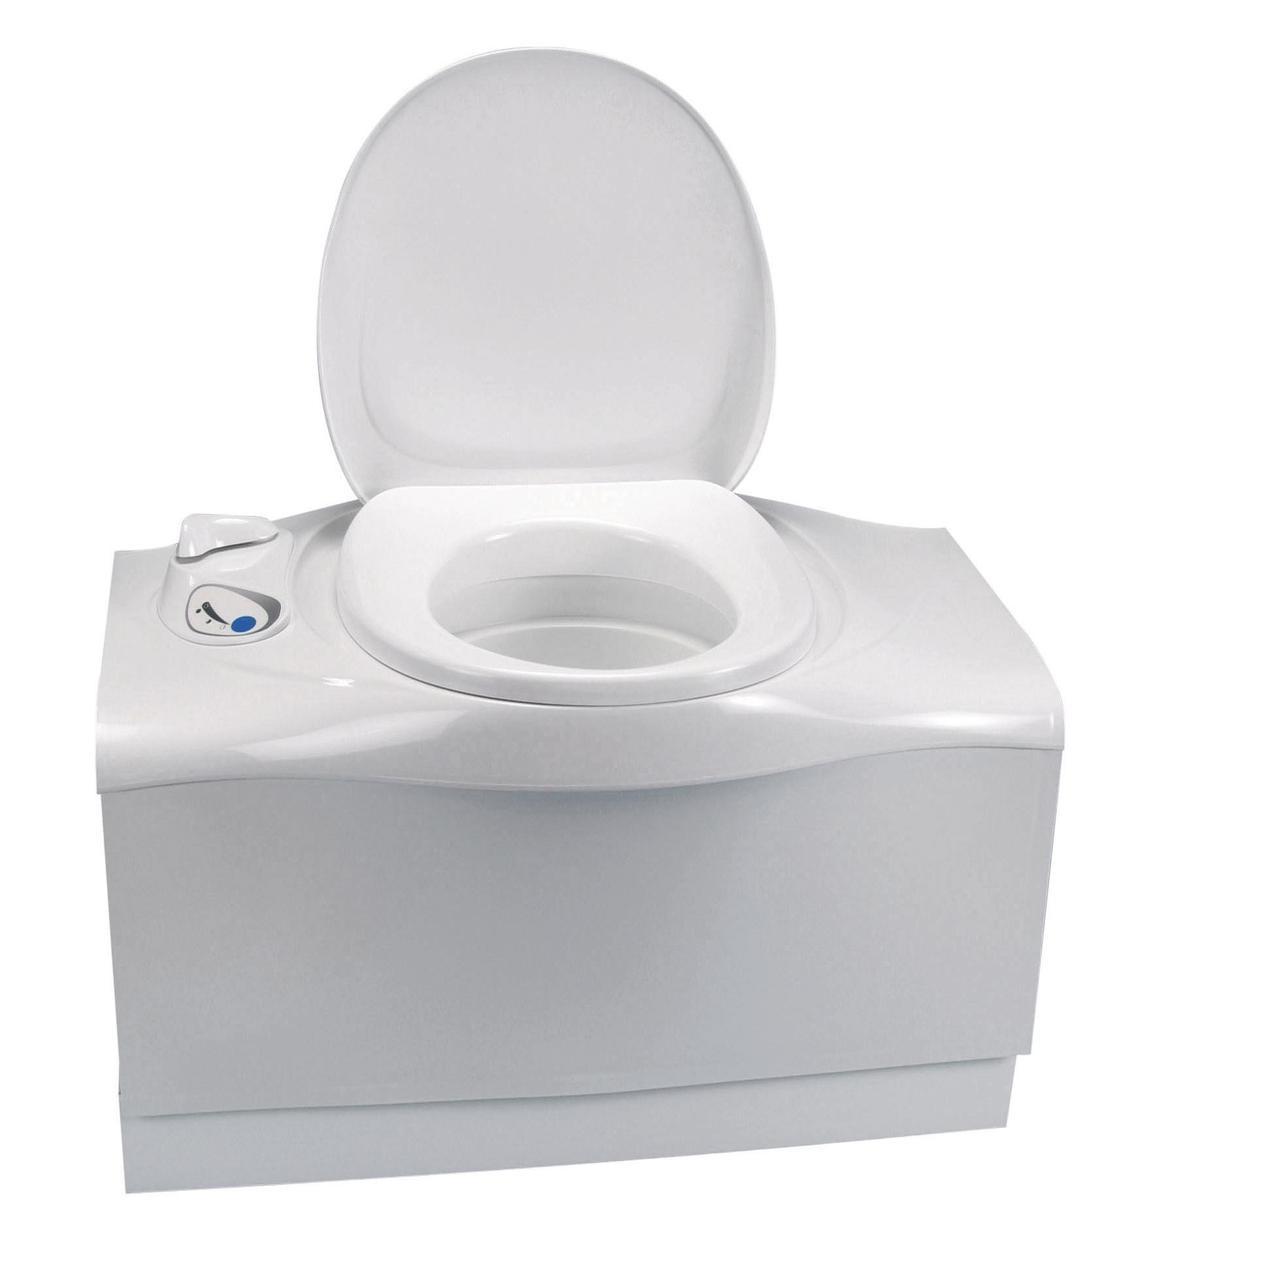 Thetford C402 Caravan & Motorhome Cassette Toilet